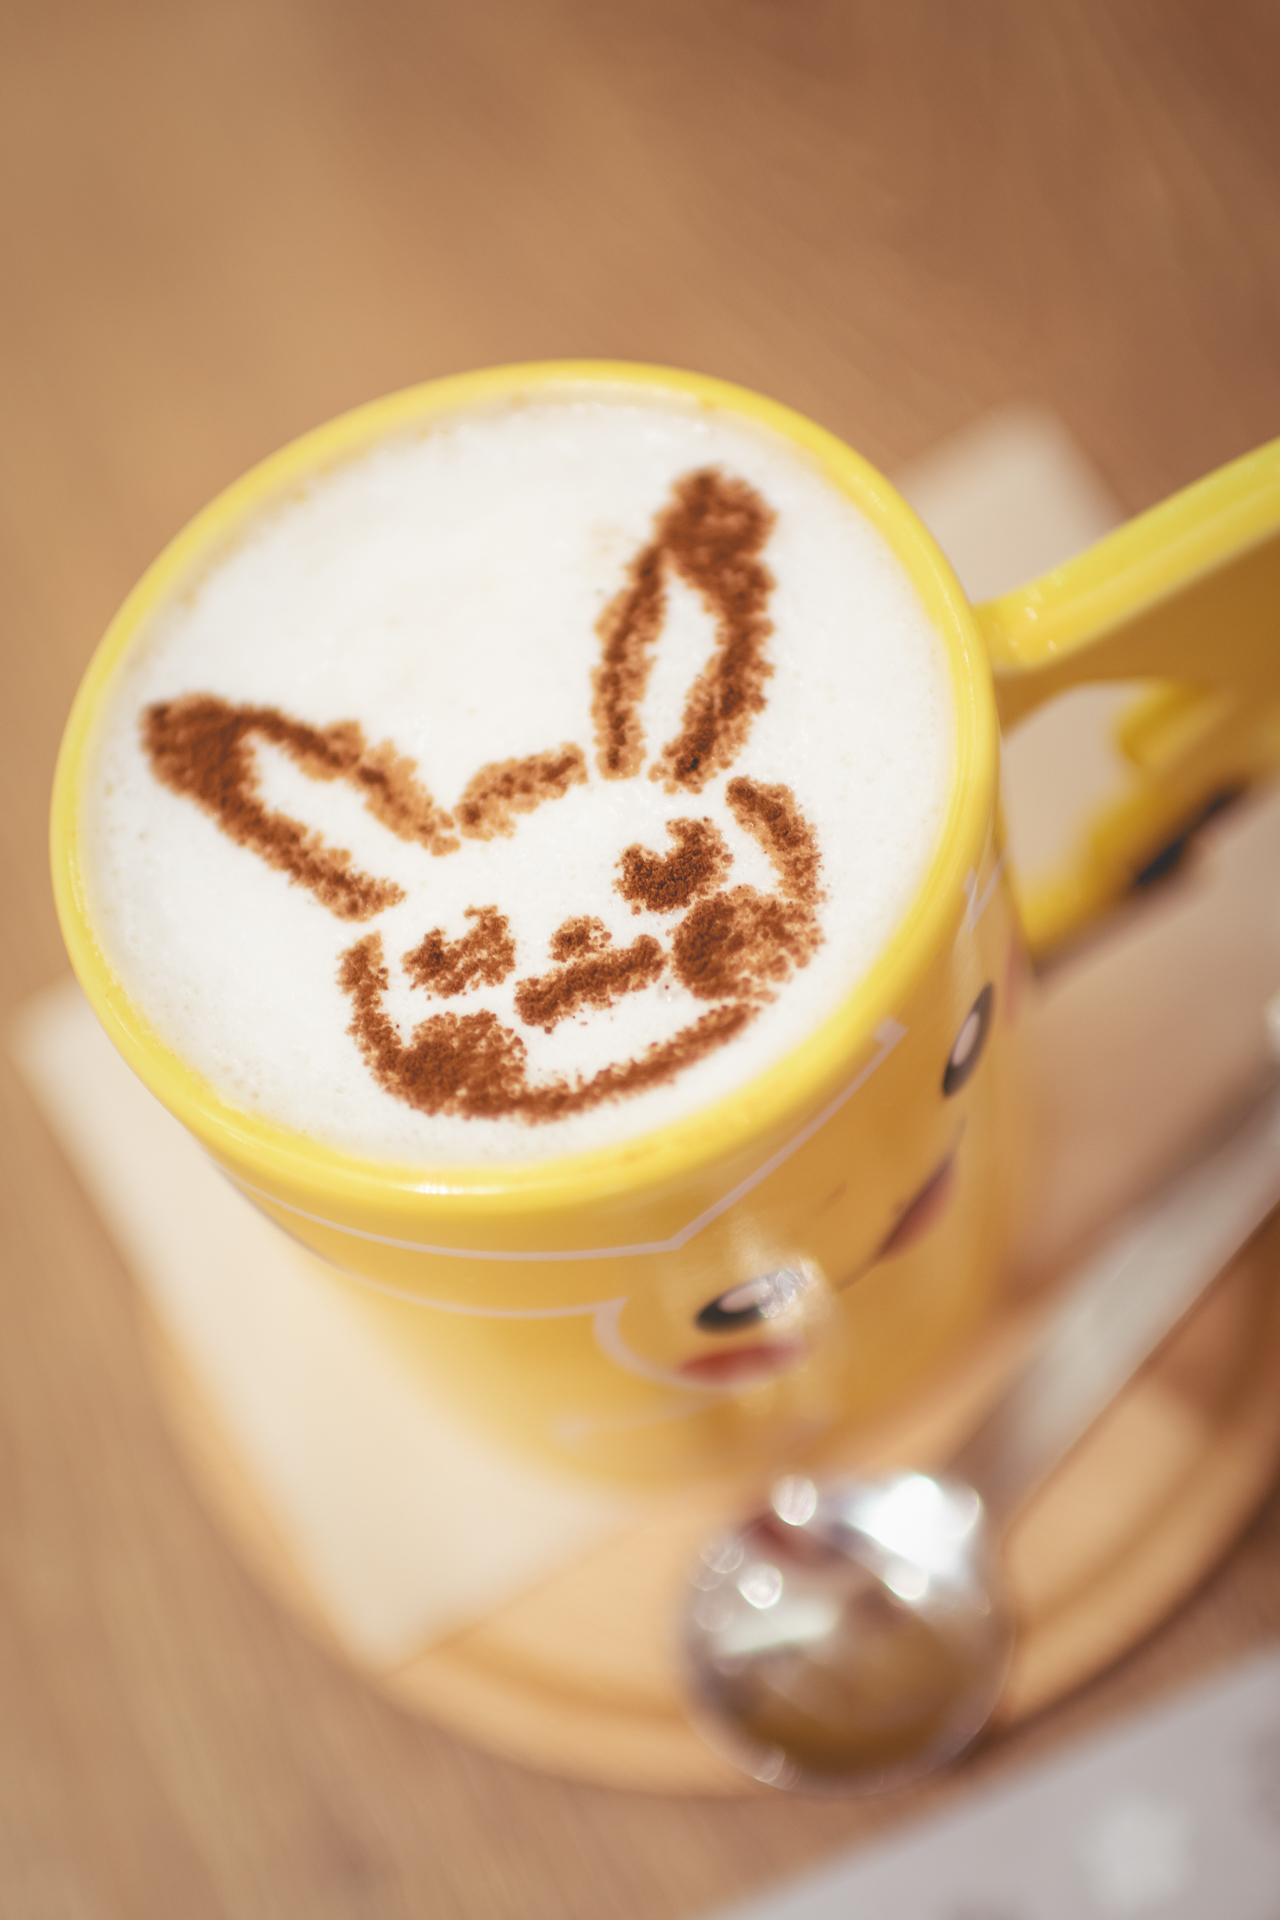 Pikachu latte